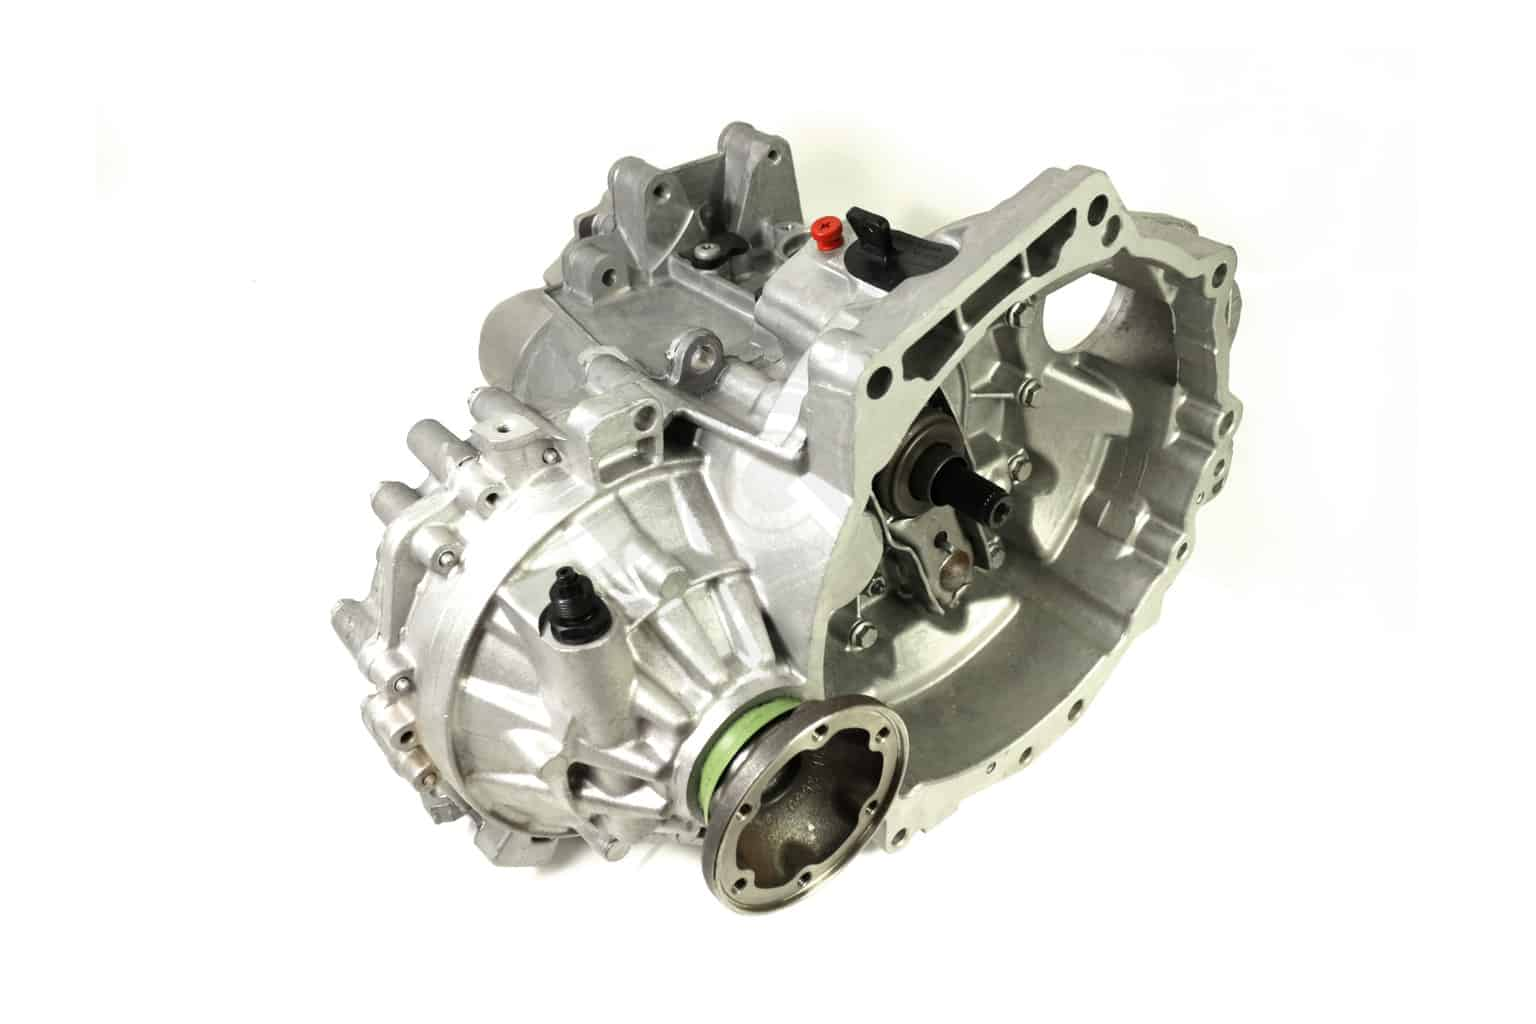 2006 vw jetta 2.5 manual transmission for sale